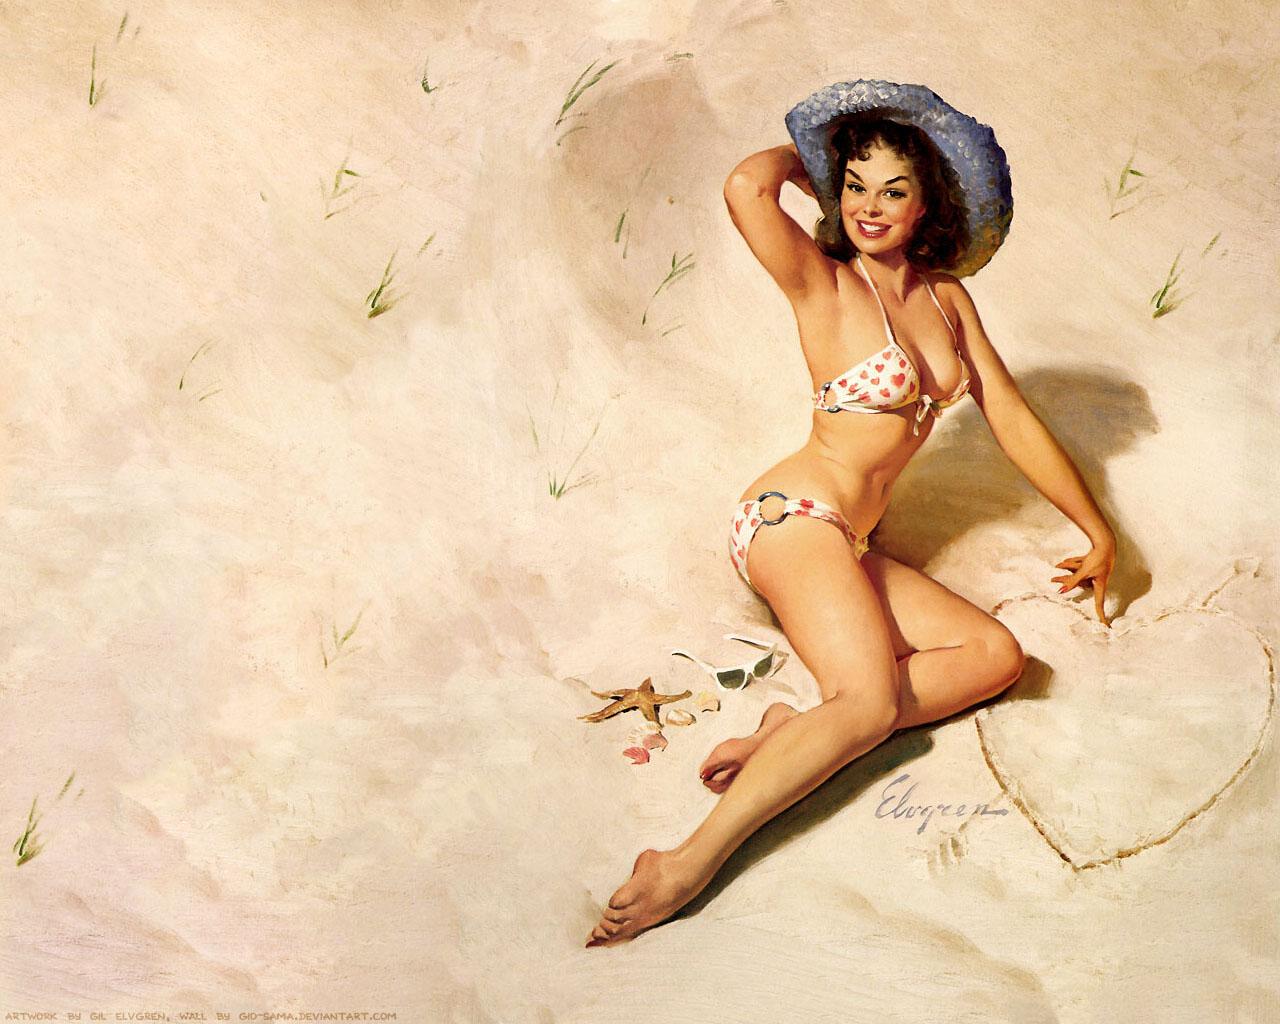 http://4.bp.blogspot.com/-xXLtmVyOE1E/UDHbBoABtZI/AAAAAAAAG6g/P3jx8z3tuyw/s1600/women_bikini_beach_vintage_classic_pin-up_50_woman_desktop_1280x1024_wallpaper-326845.jpg